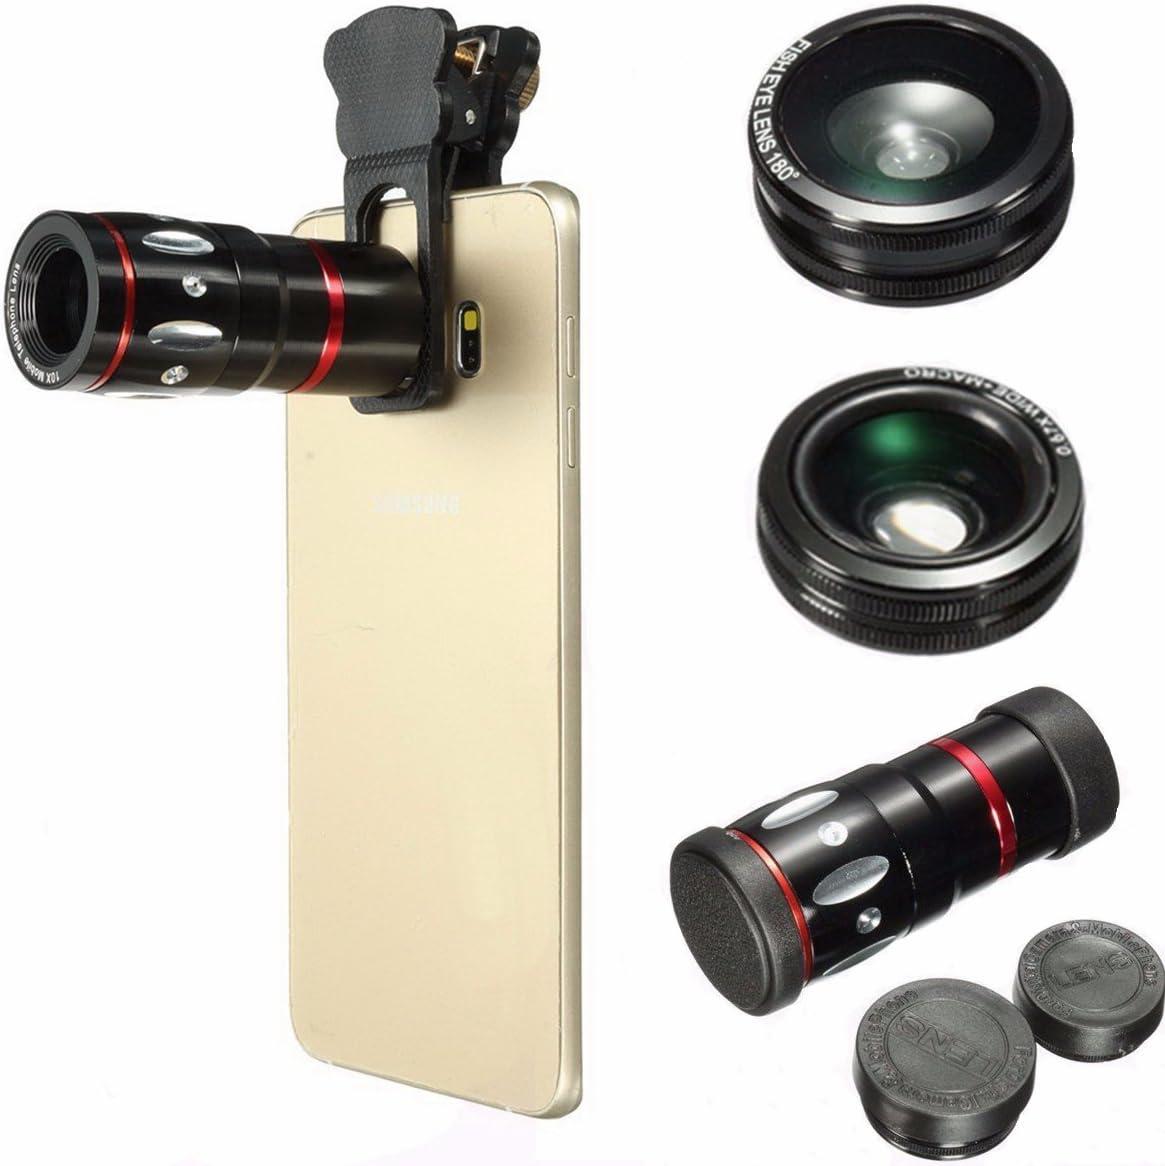 Babiken 4 en 1 Lente de cámara para teléfono móvil – Zoom teleobjetivo + Lente Ojo de pez para teléfono + Lente Amplia y Lente de cámara Macro para iPhone 8/Samsung S7,S8/Huawei